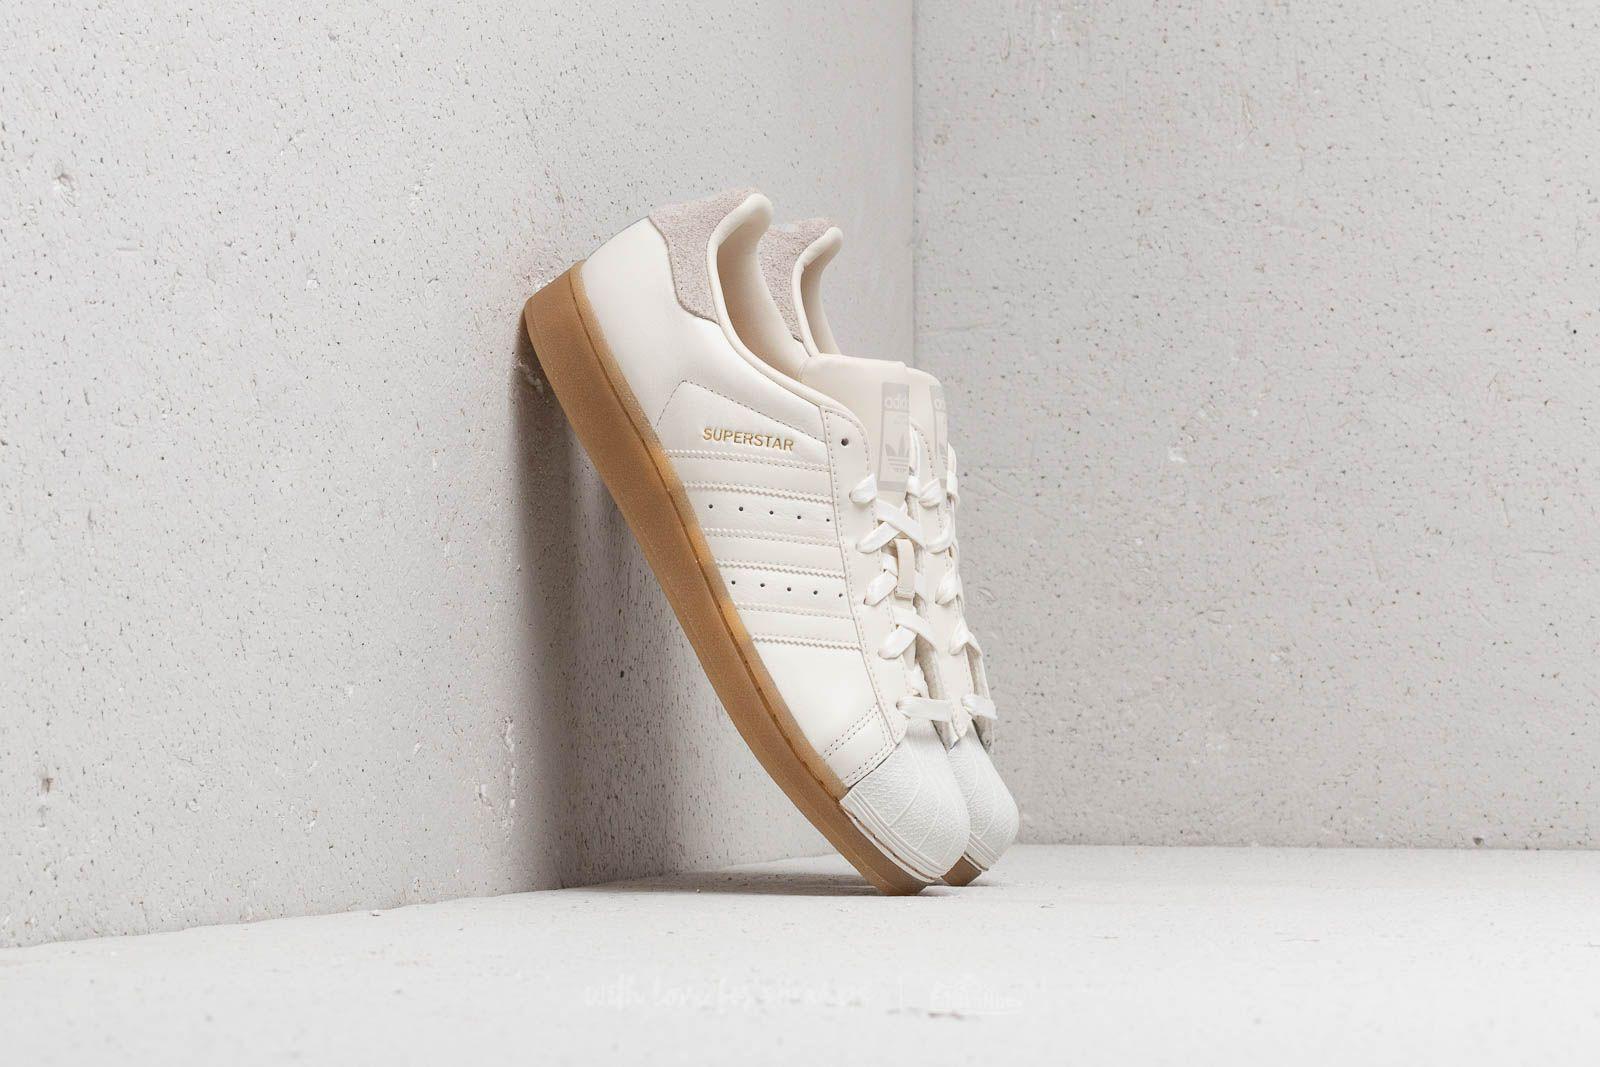 adidas Superstar W Cloud White/ Cloud White/ Gum4 za skvělou cenu 1 880 Kč koupíte na Footshop.cz